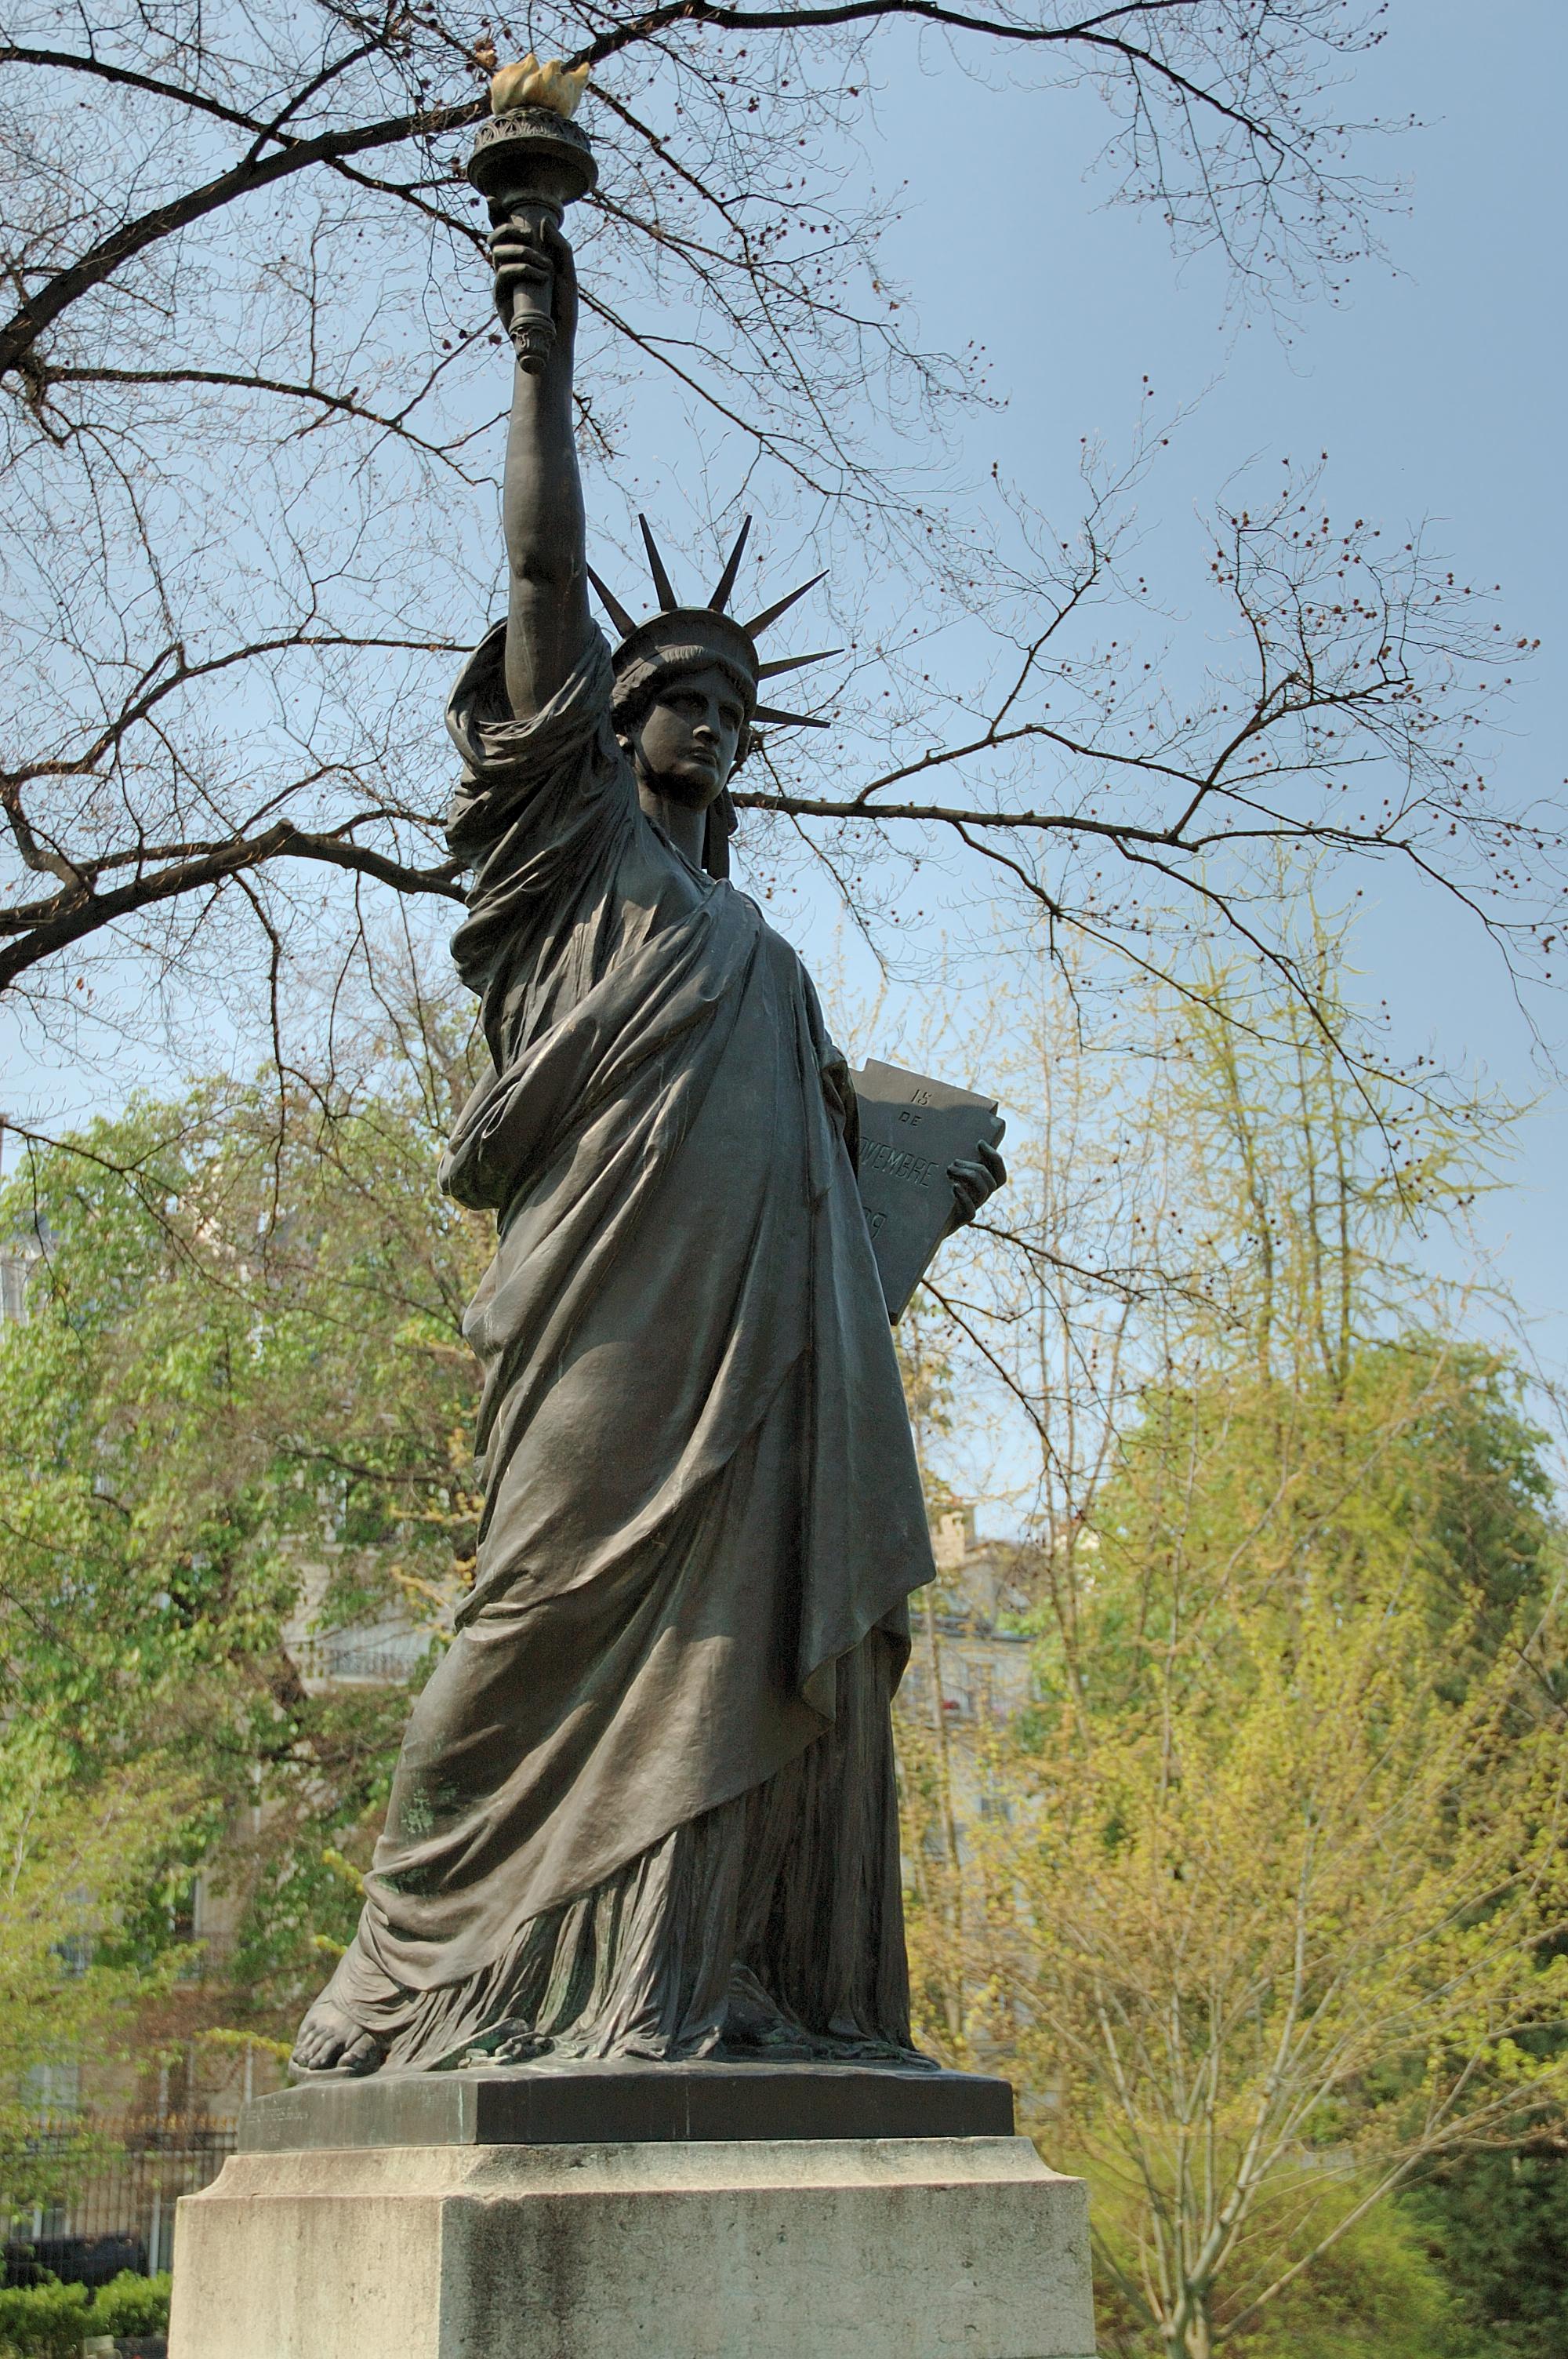 Préférence File:Statue de la liberte.jpg - Wikimedia Commons LW34